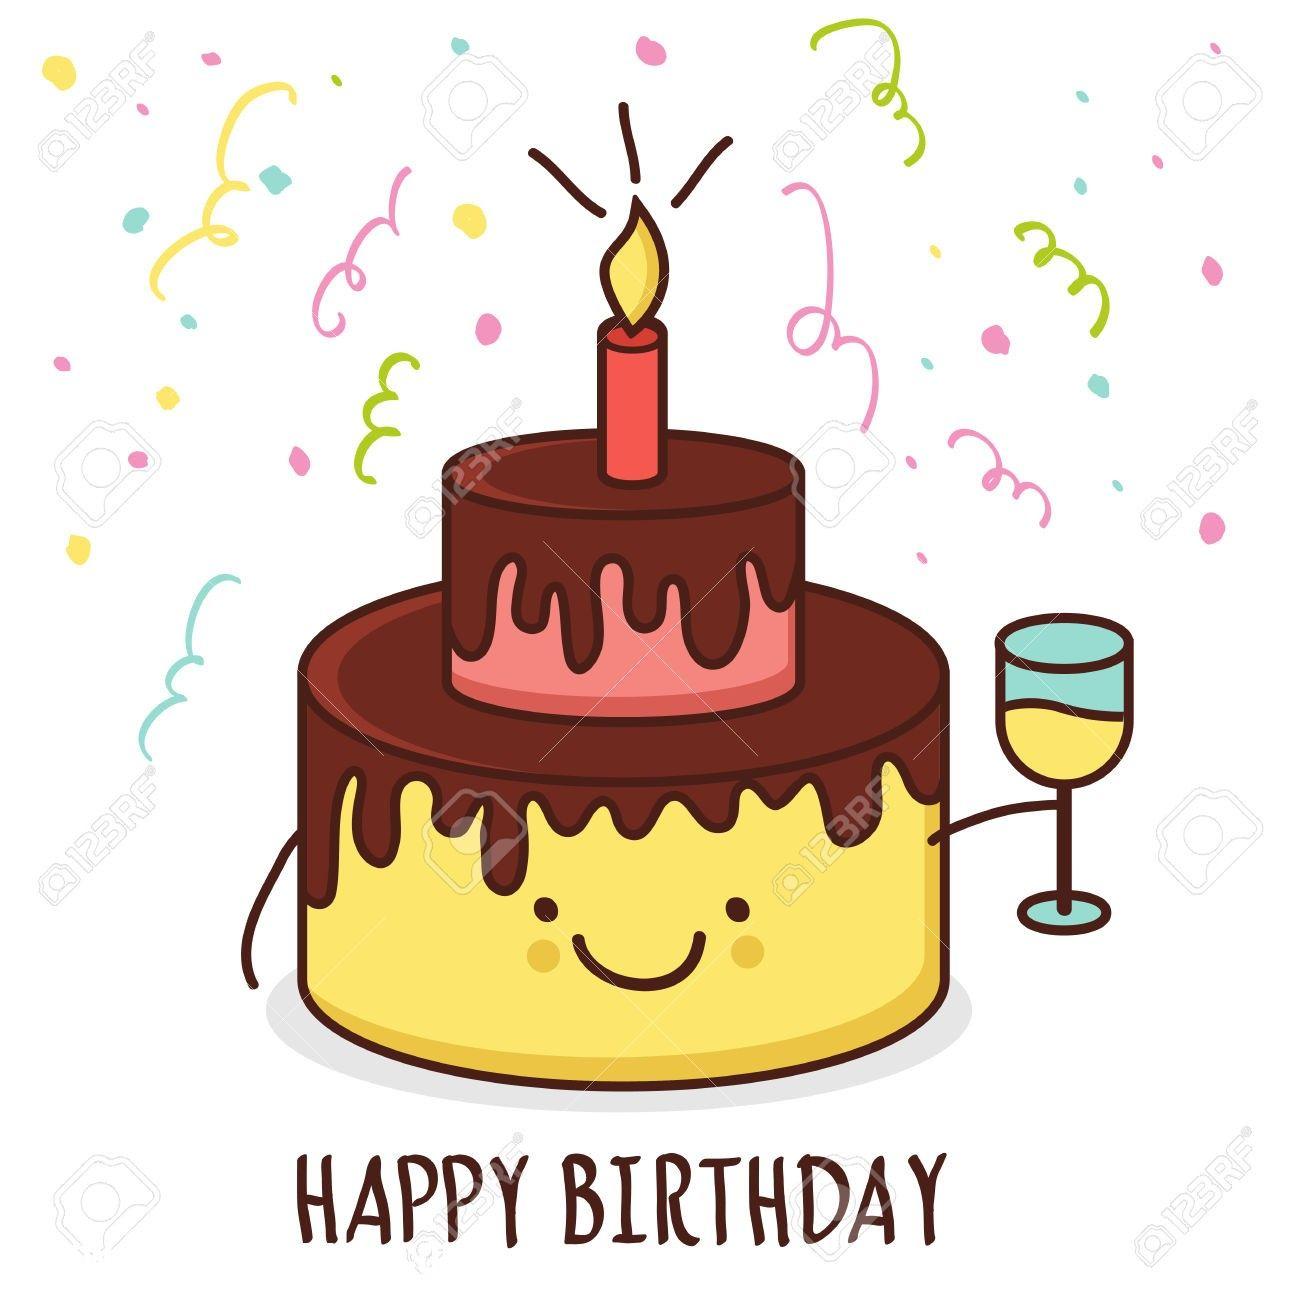 Cute Cartoon Birthday Cakes Cartoon birthday cake, Cool